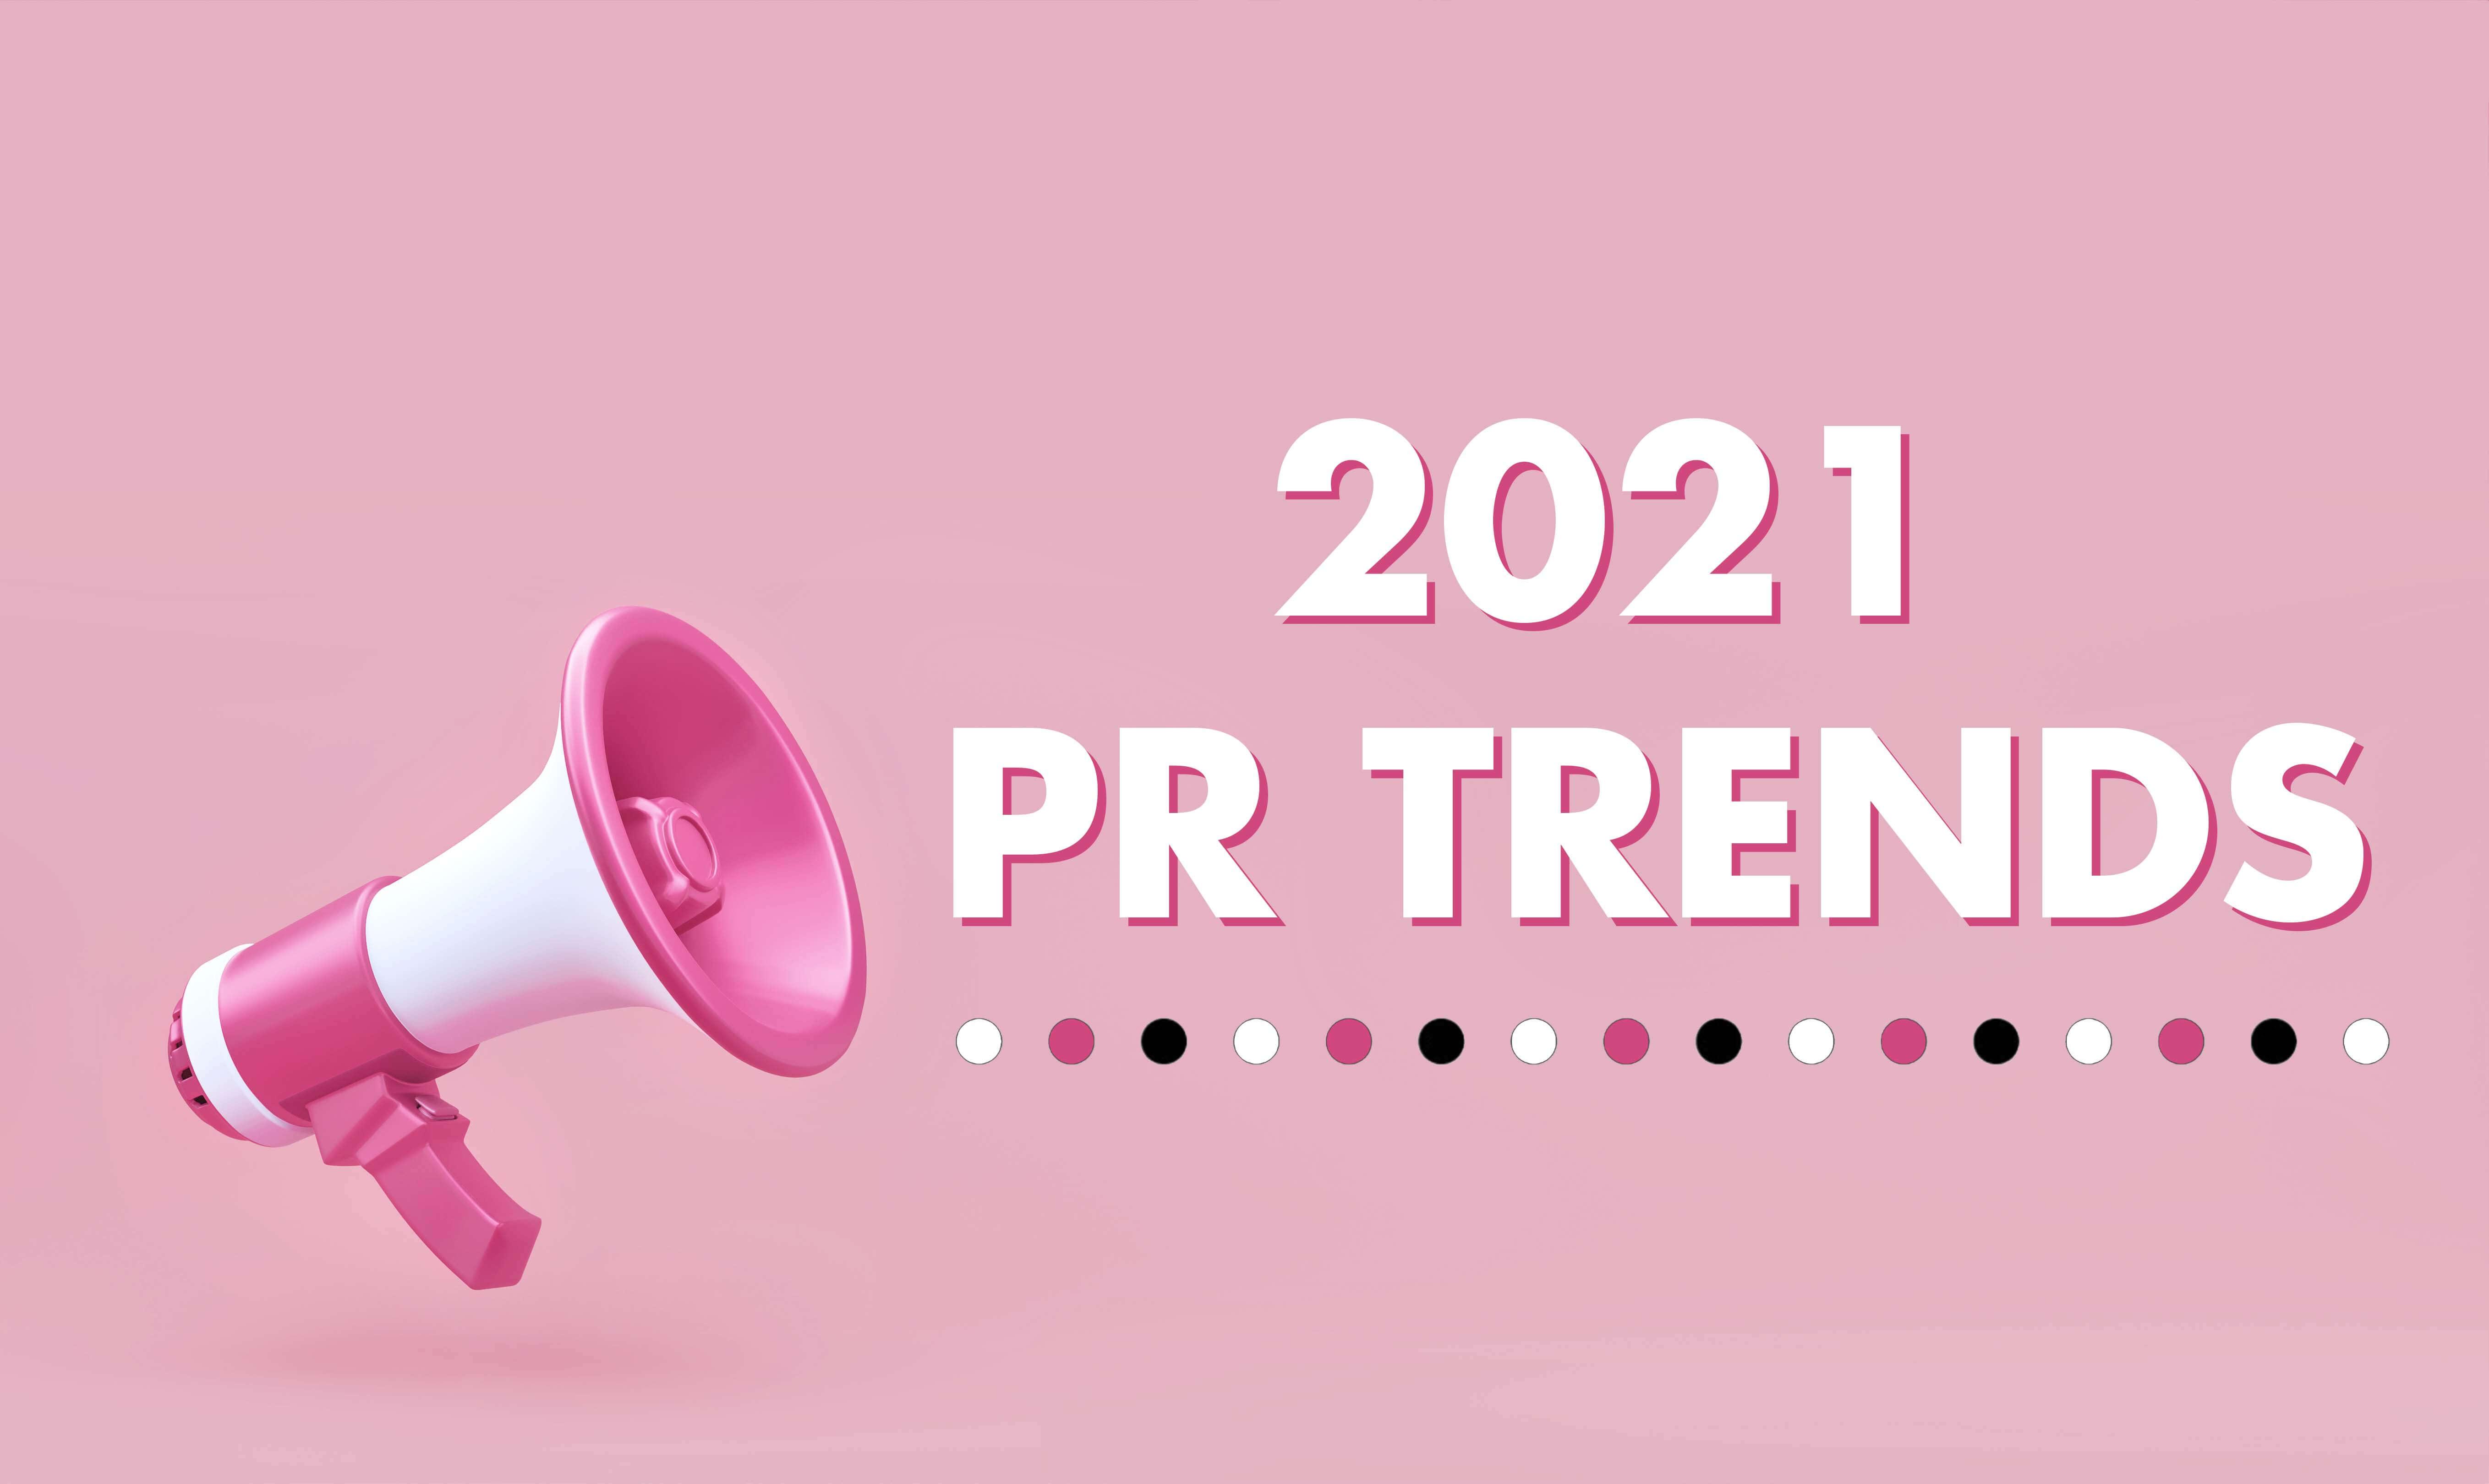 PR trends, EAST VILLAGE PR, Birmingham PR agency